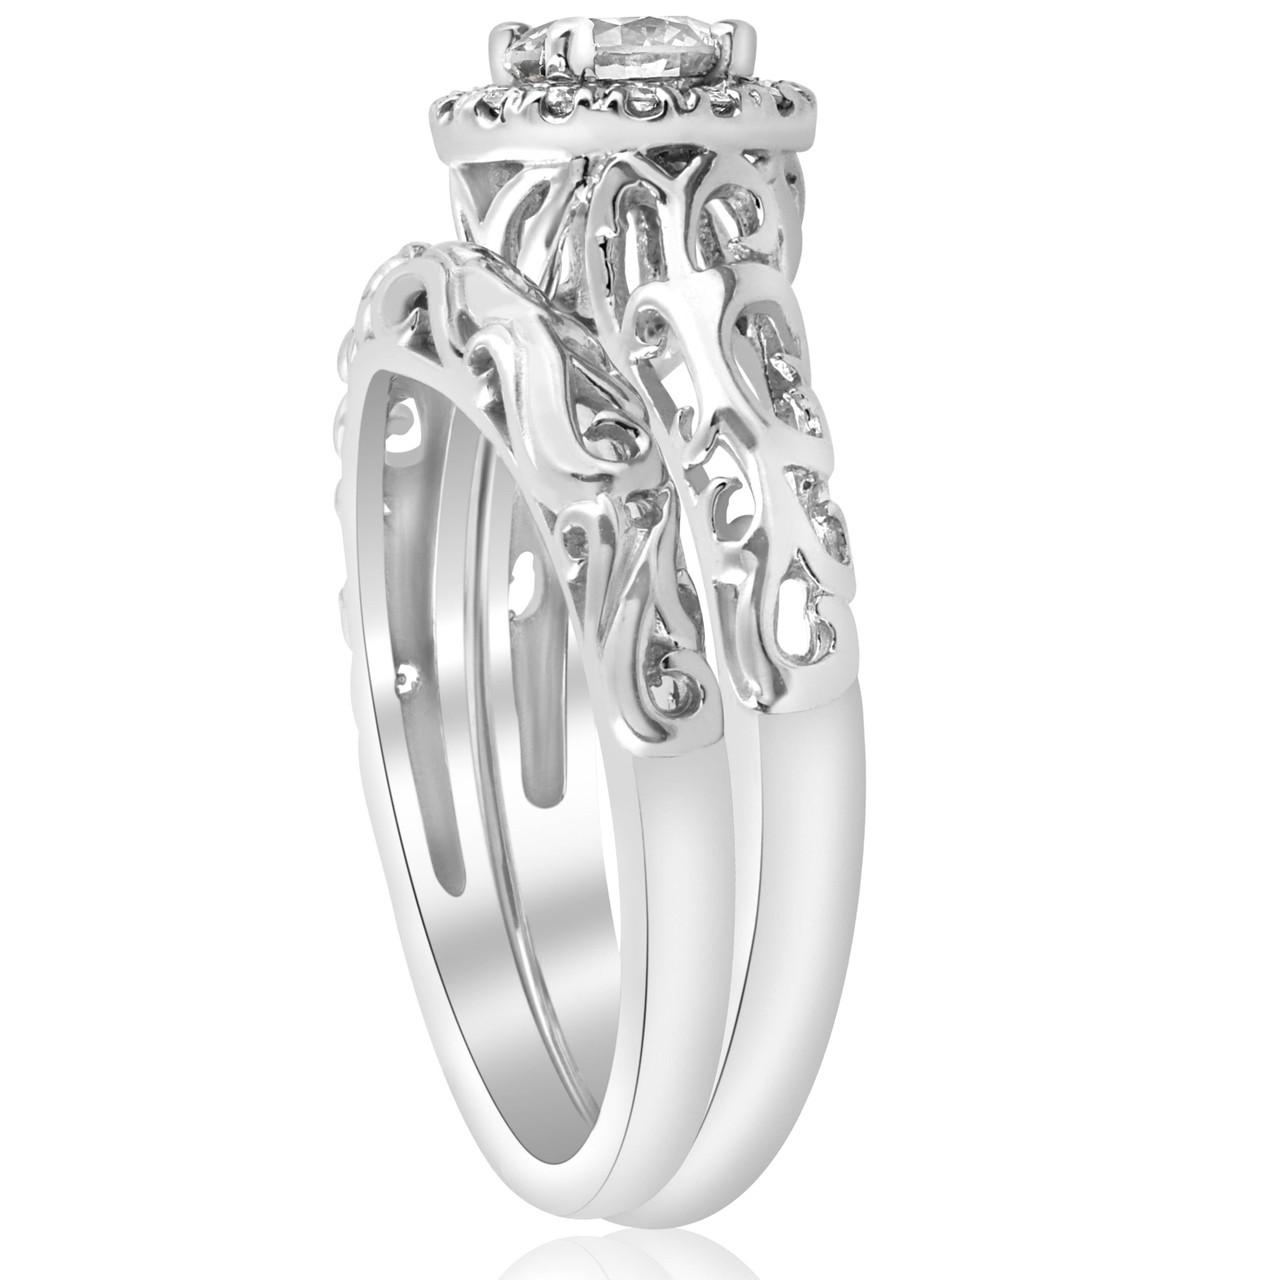 5 8ct Round Diamond Vintage Engagement Wedding Ring Set 14k White Gold